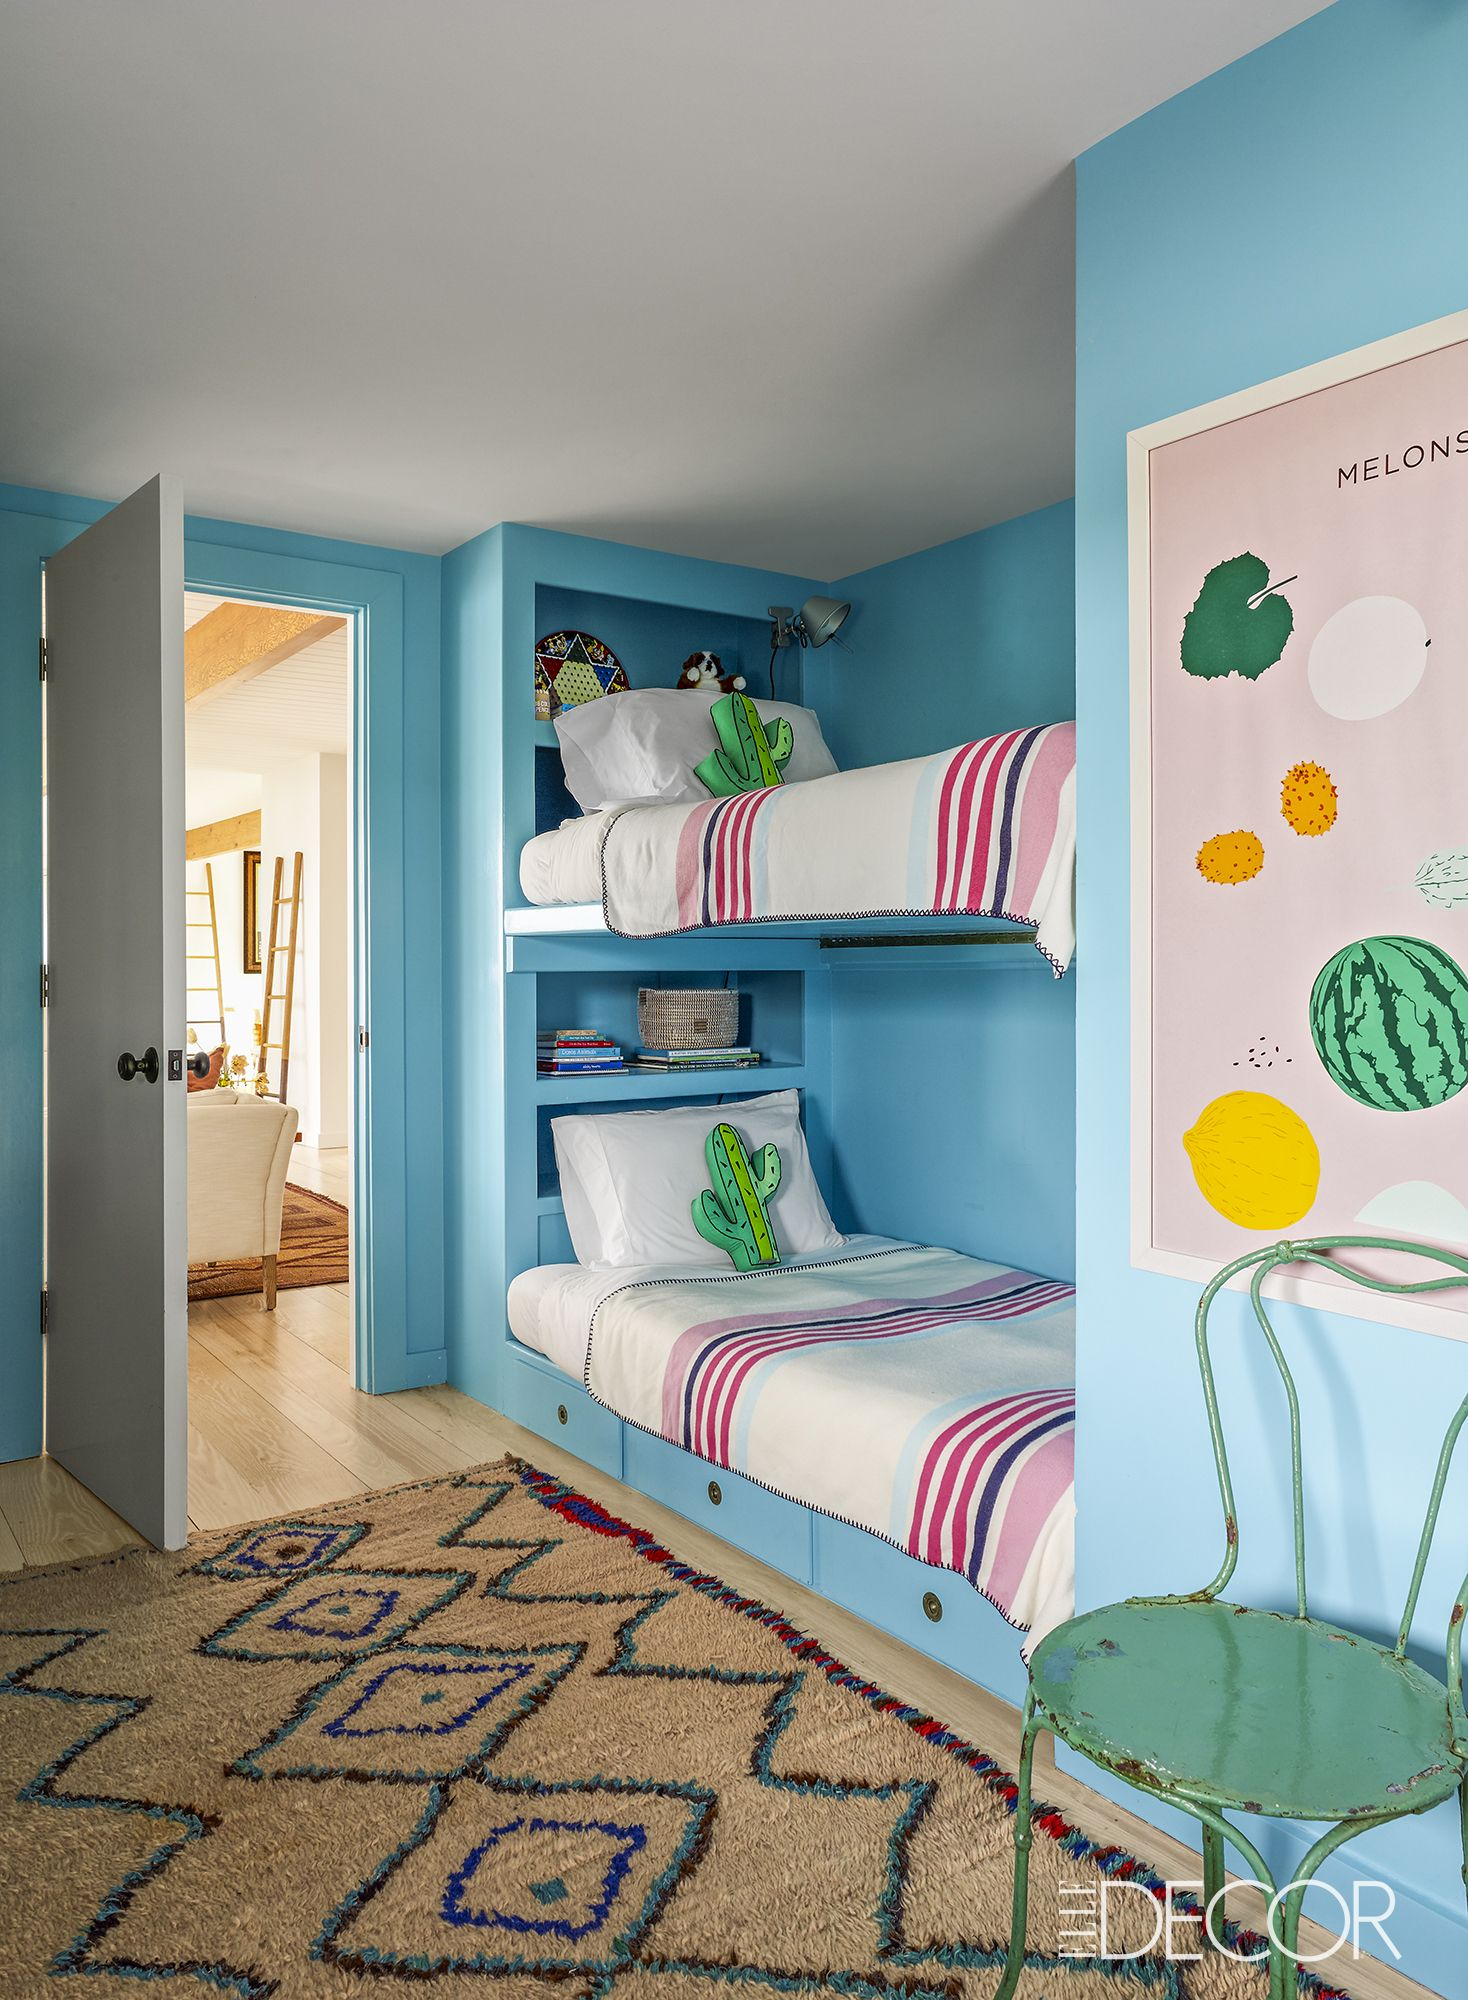 18 cool kids room decorating ideas kids room decor rh elledecor com